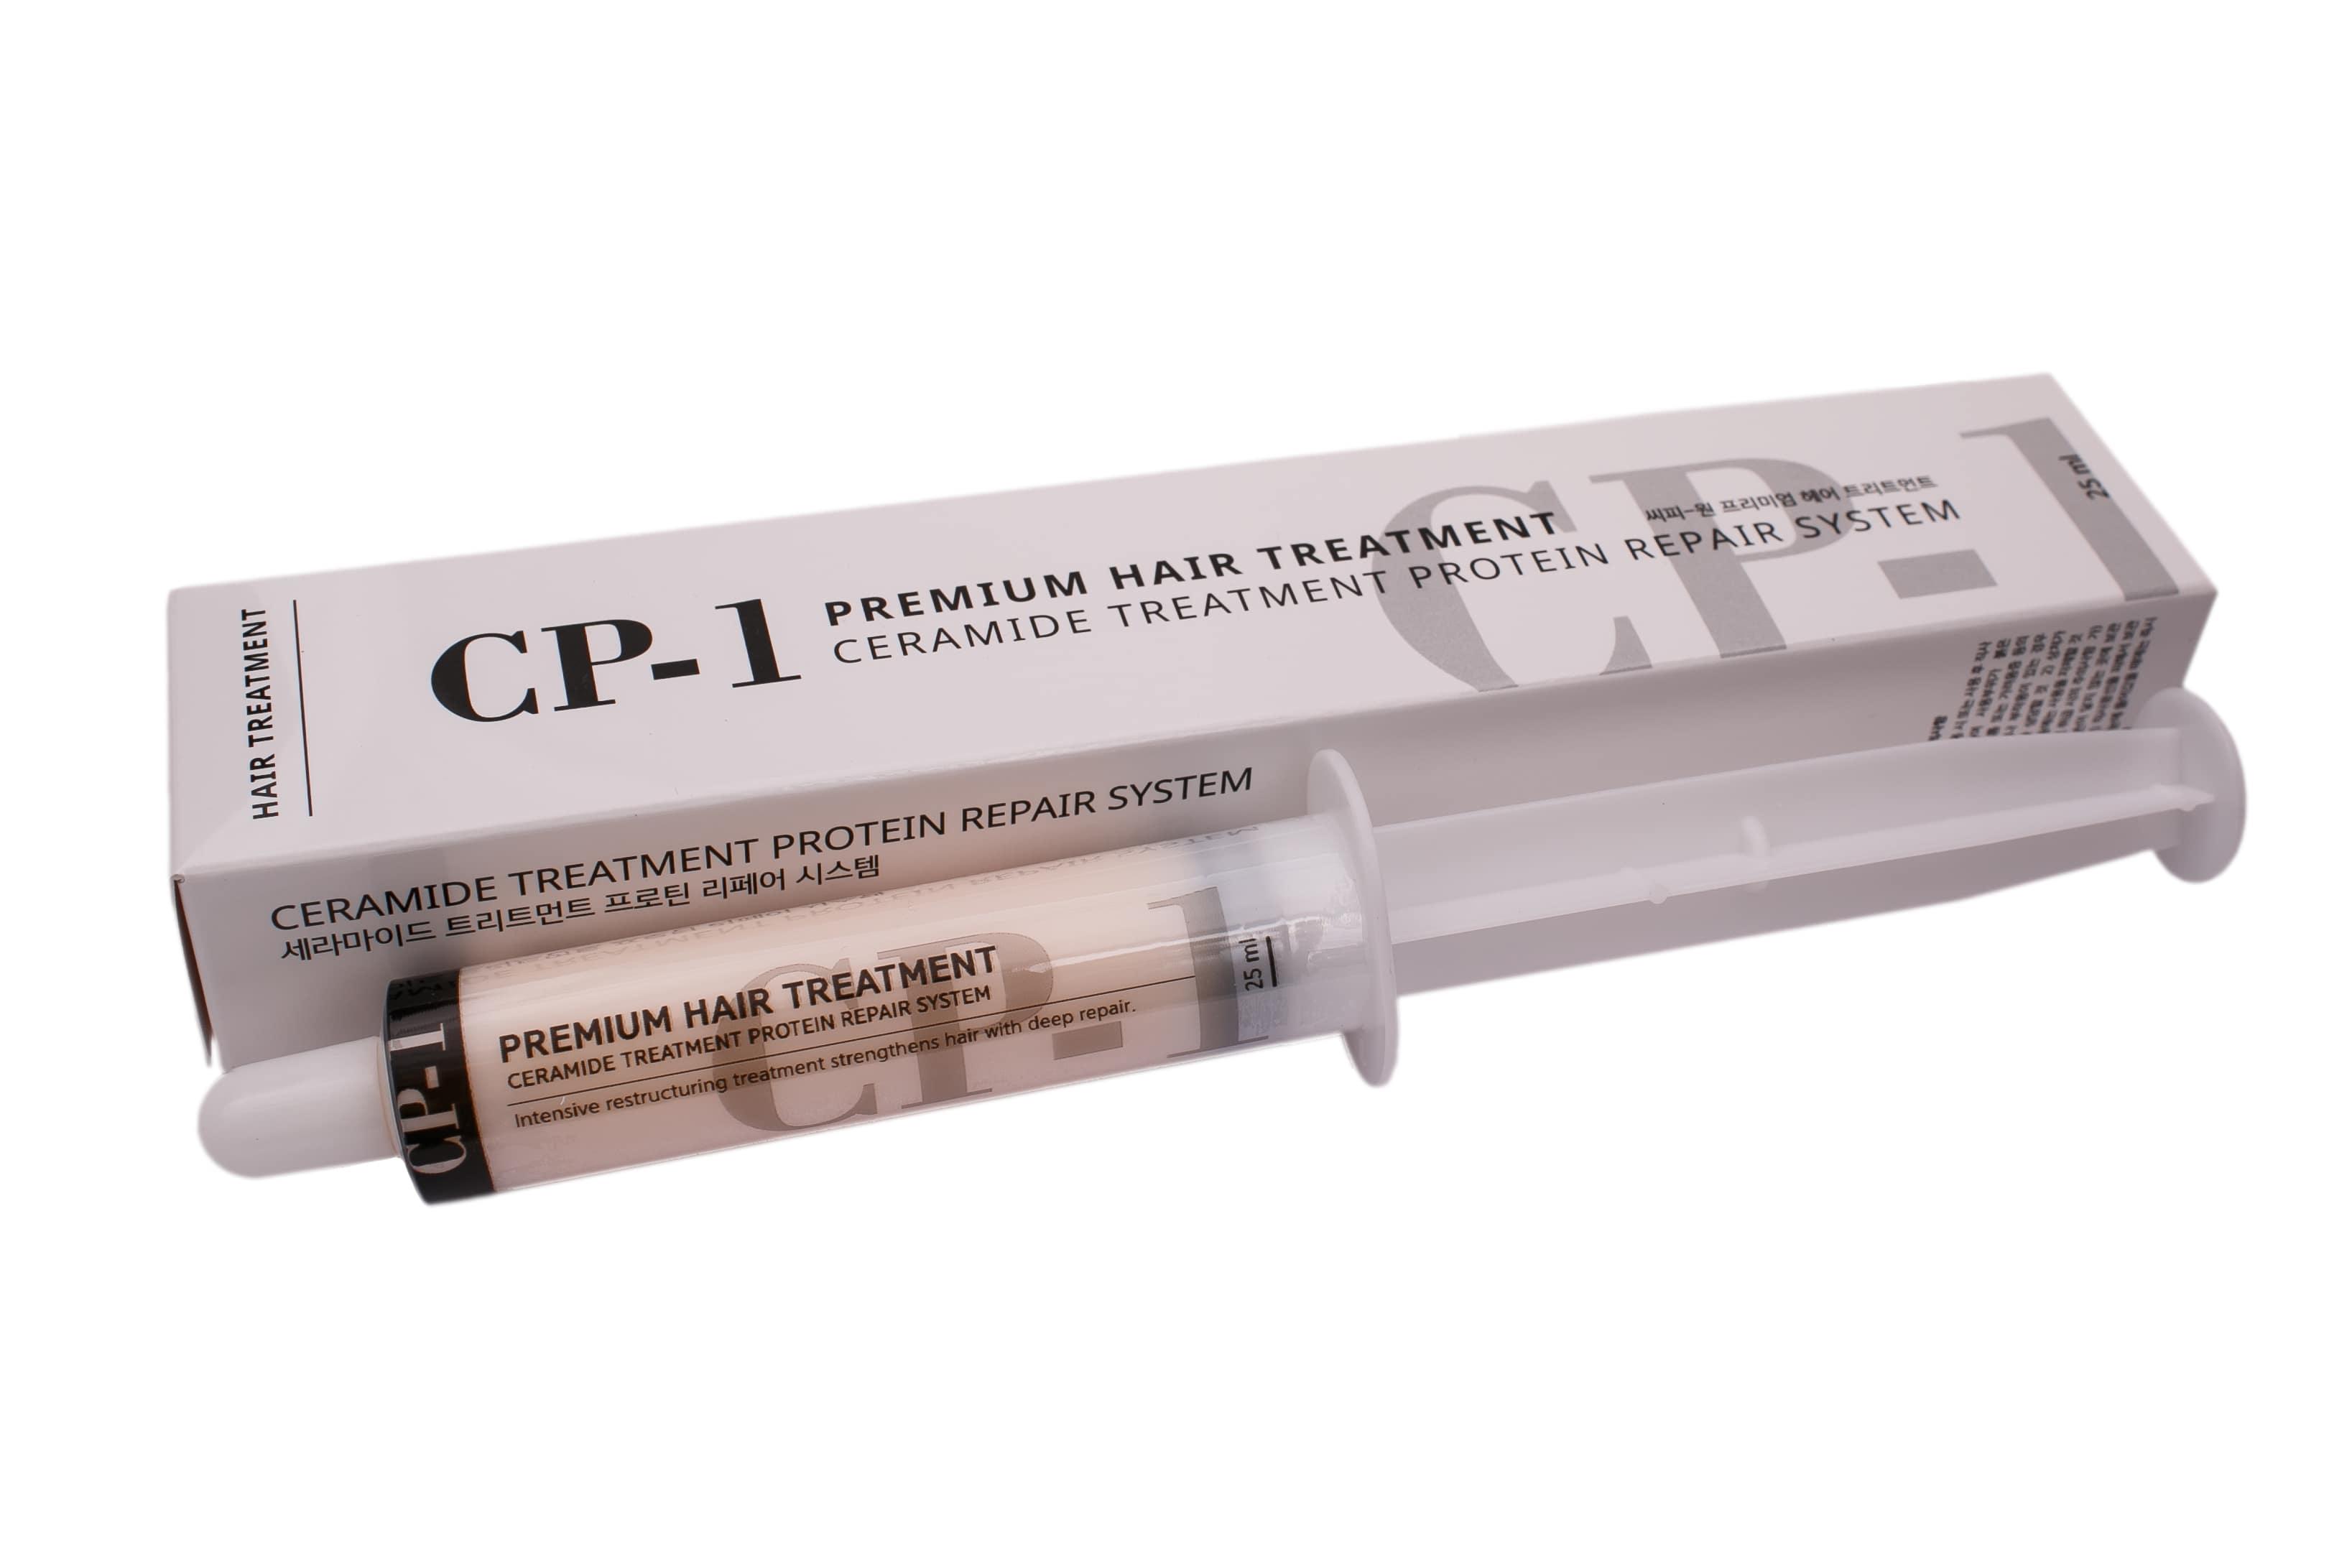 Esthetic House Маска CP-1 Premium Protein Treatment Протеиновая для Волос, 25 мл